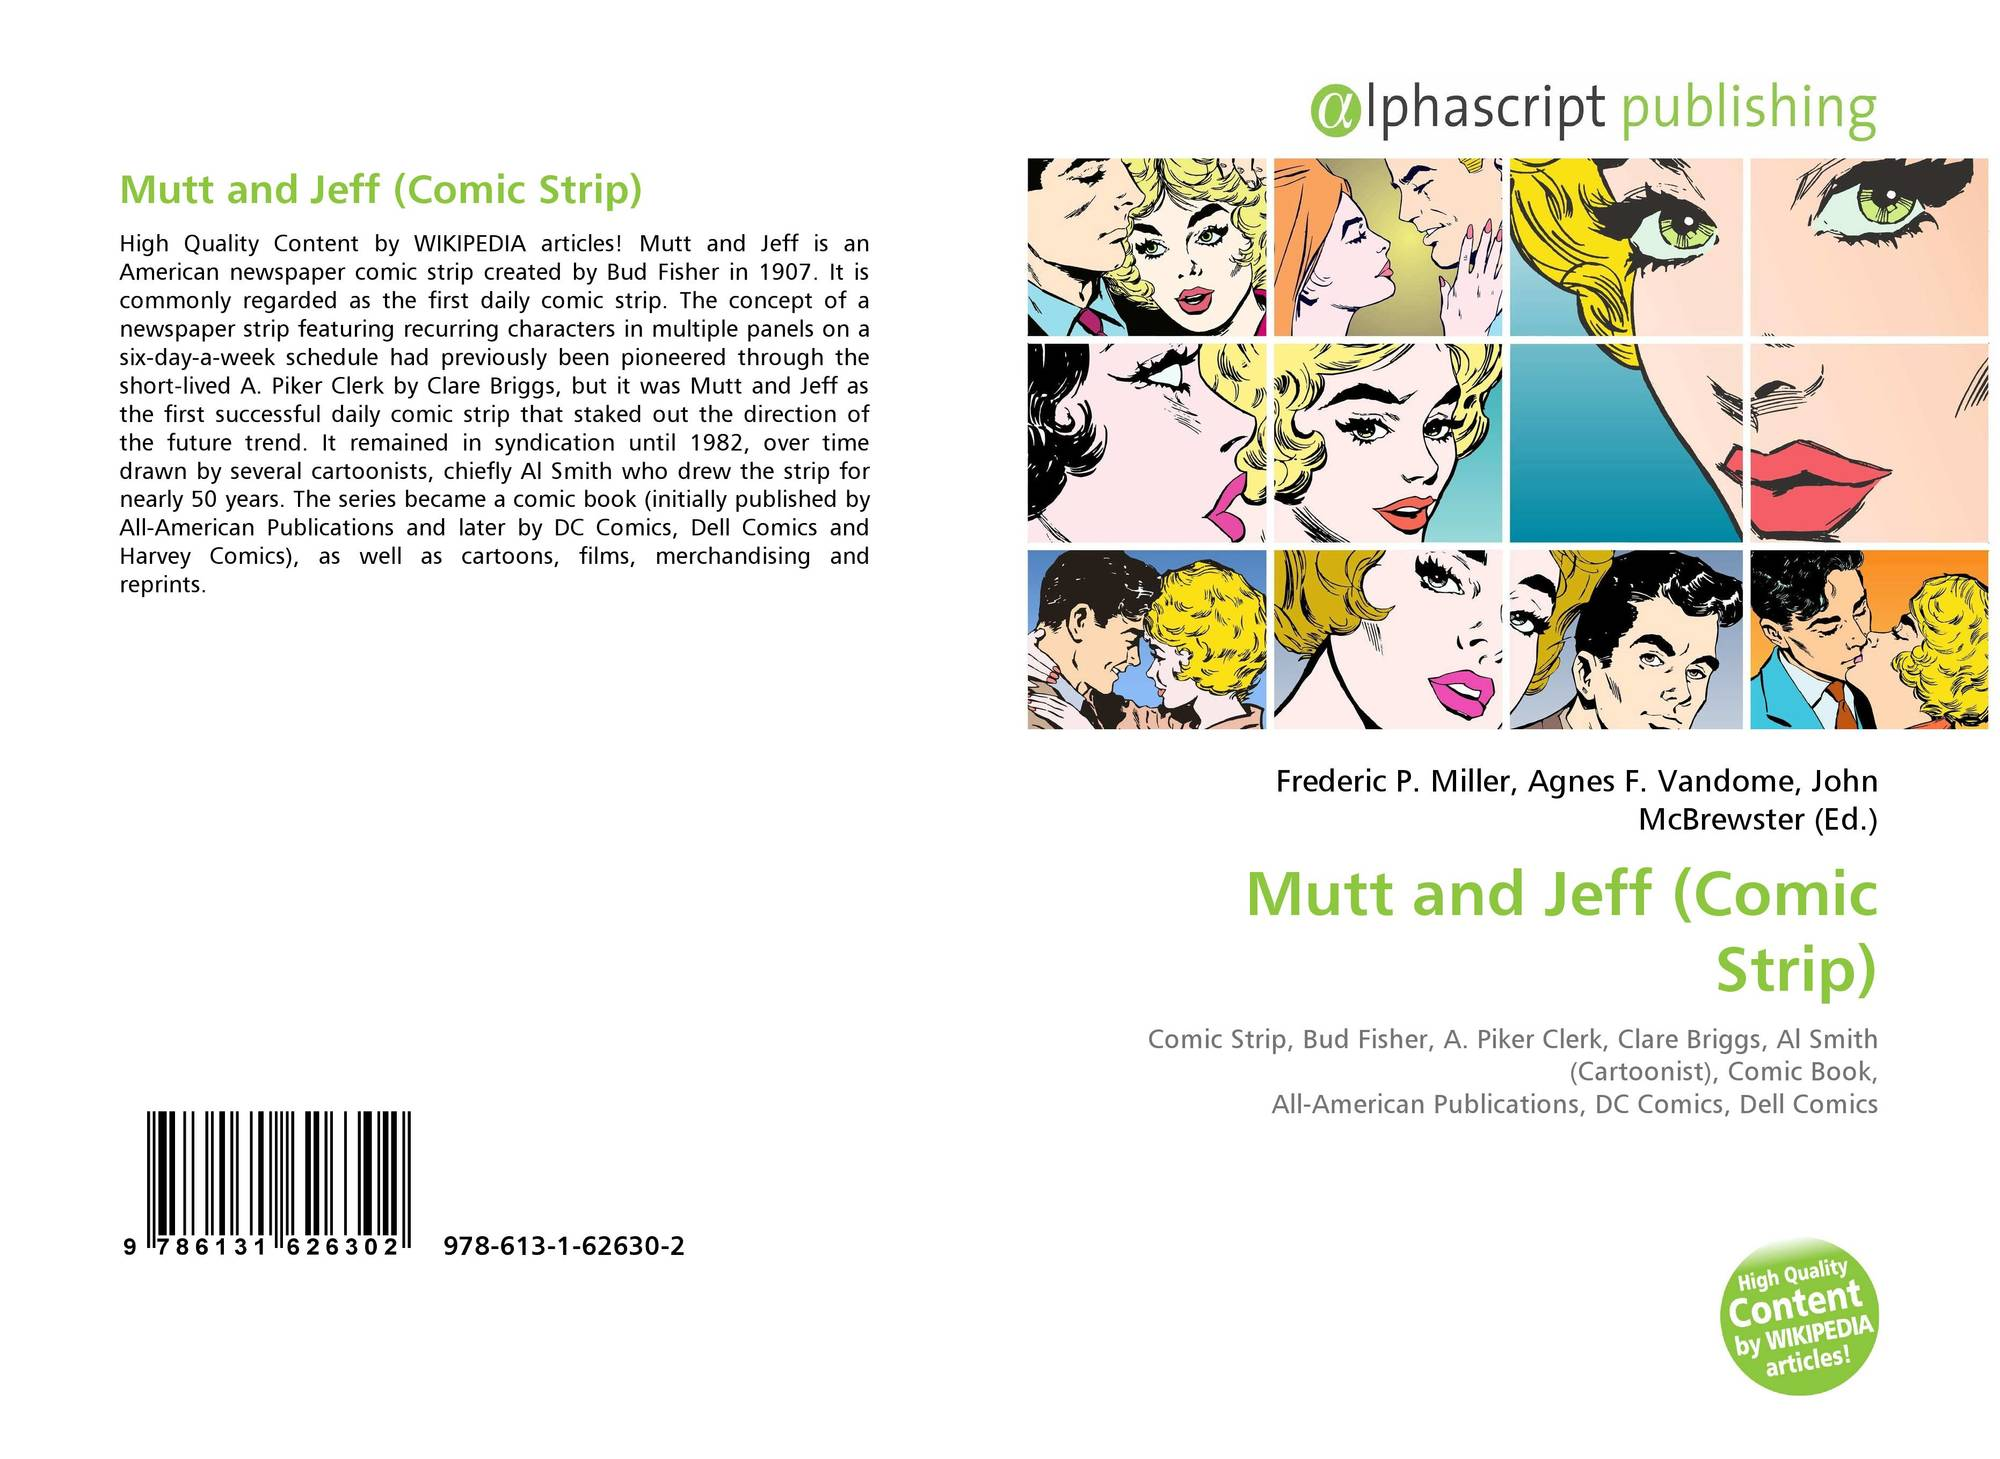 Mutt and Jeff (Comic Strip), 978-613-1-62630-2, 6131626308